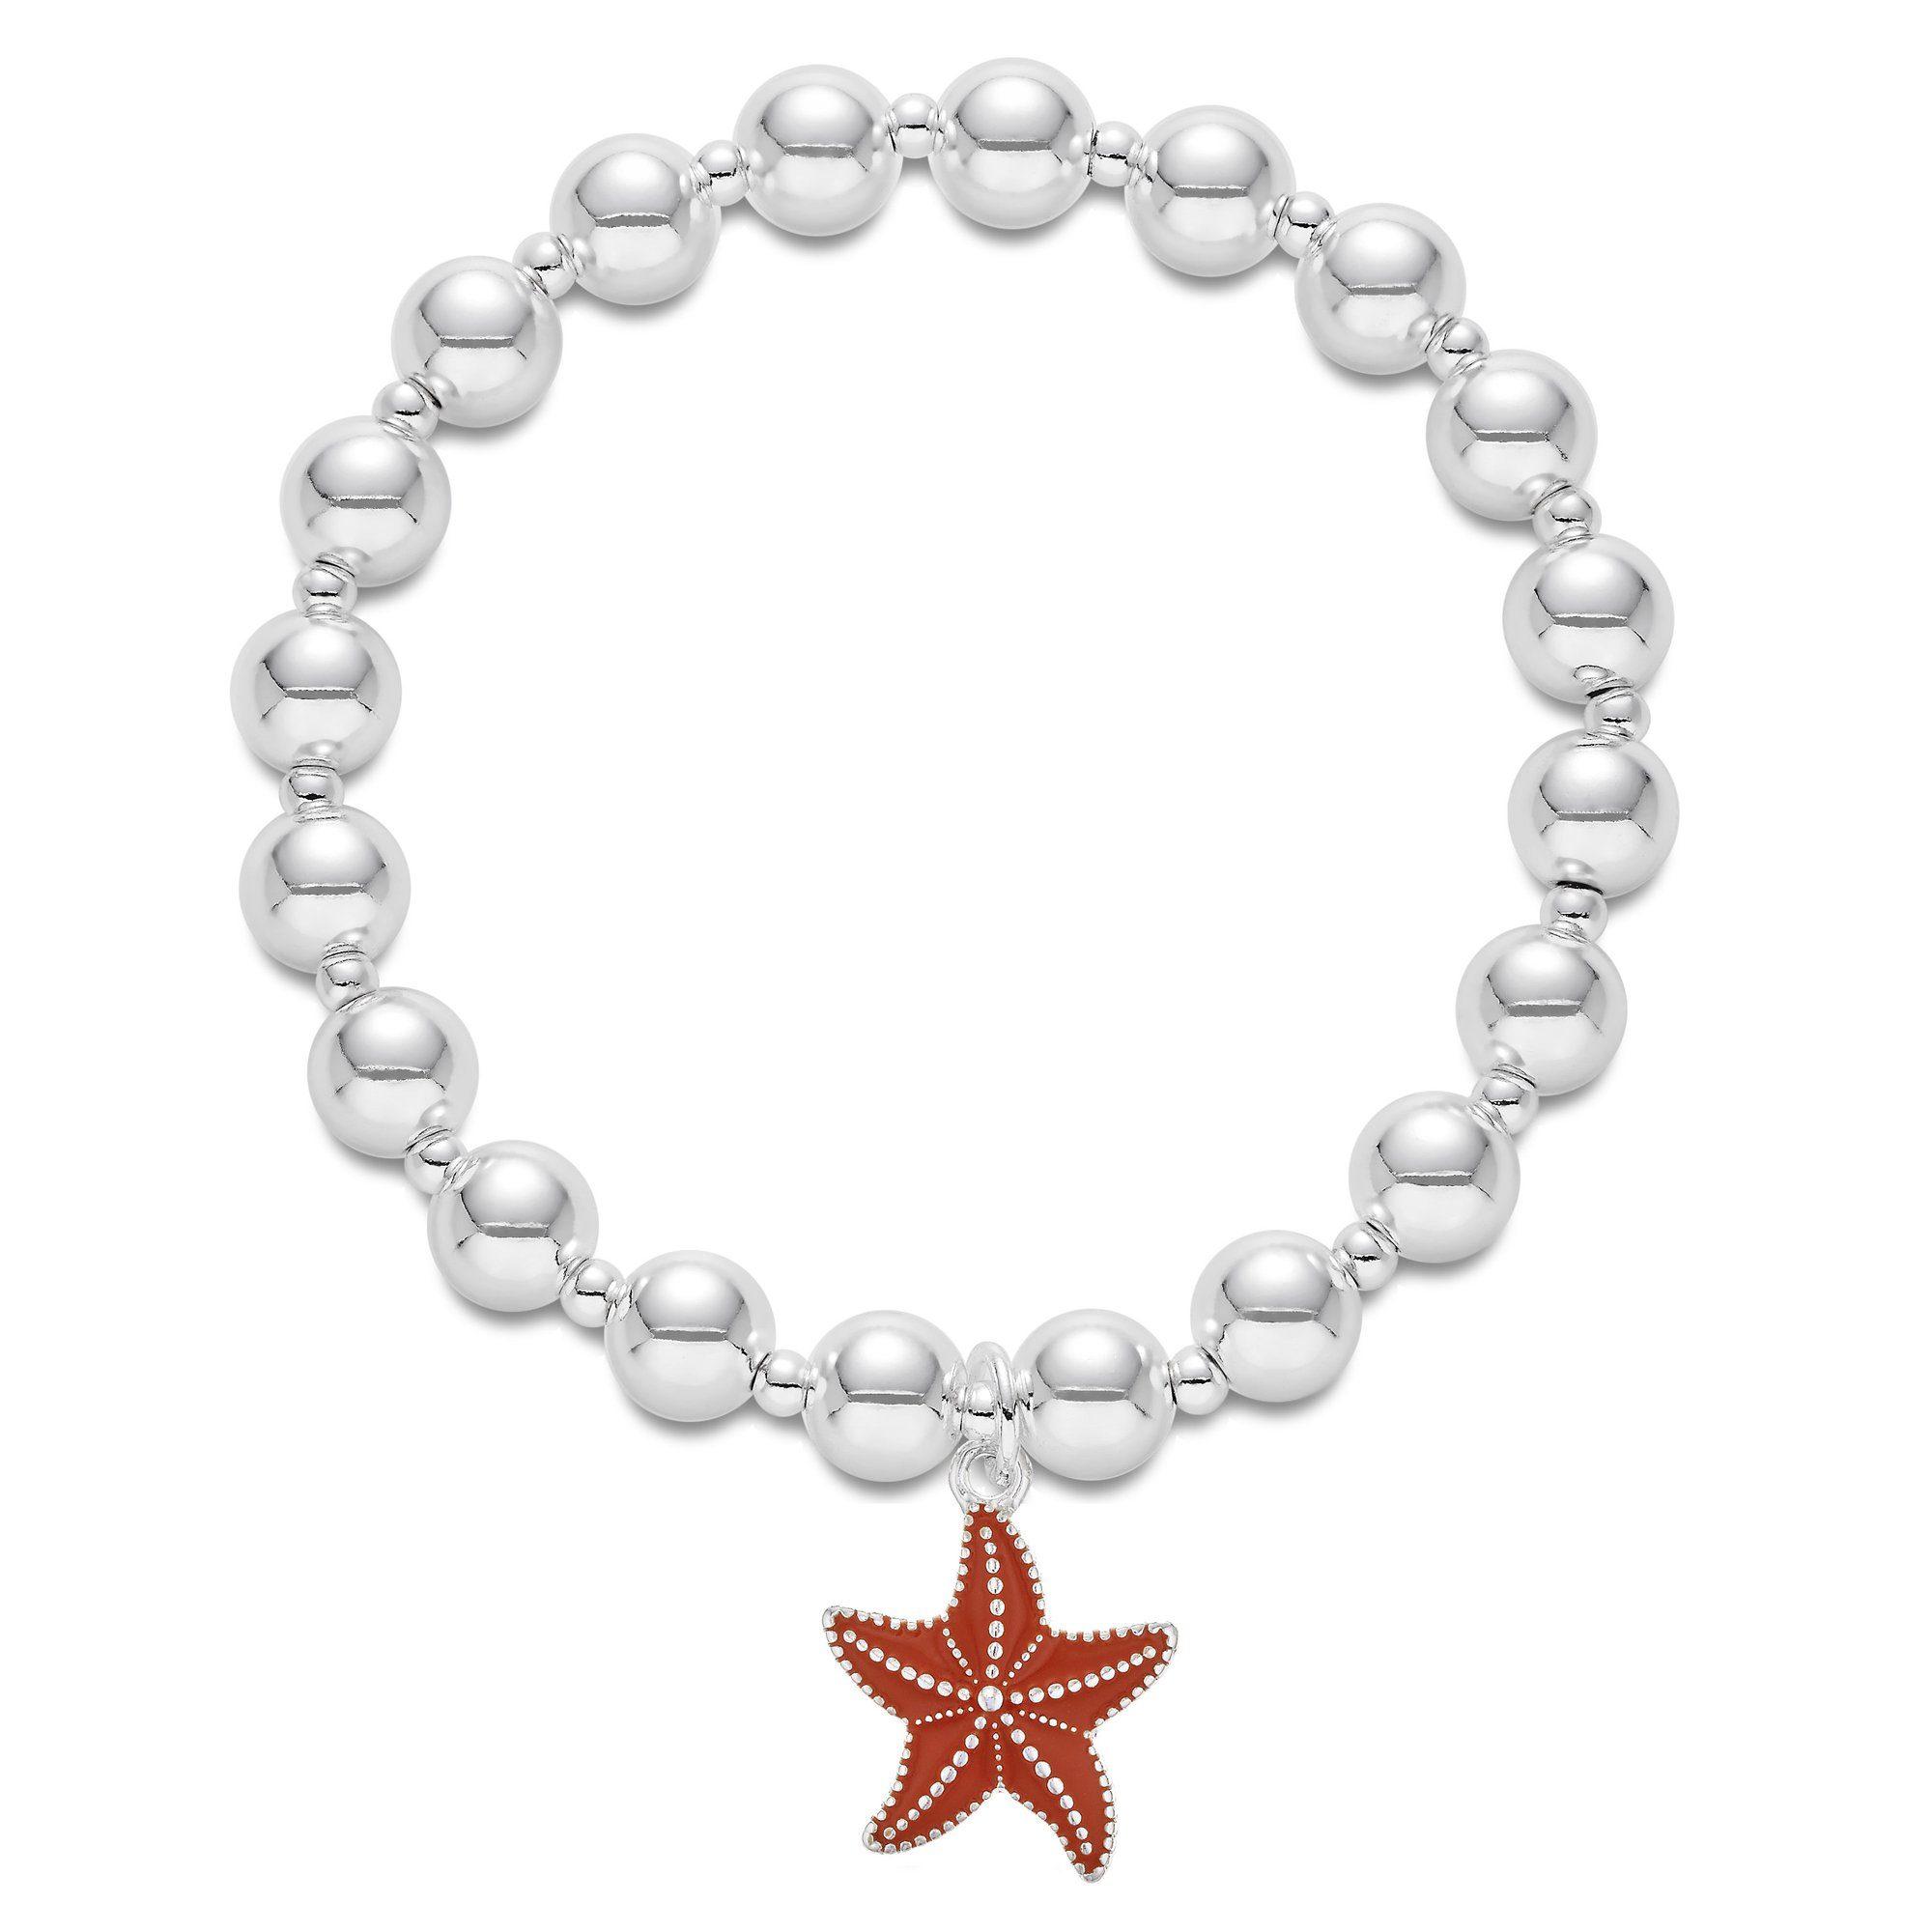 Stretch London Online Armband Silberfarben Kaufen Buckley »messing Seestern« F1TclKJ